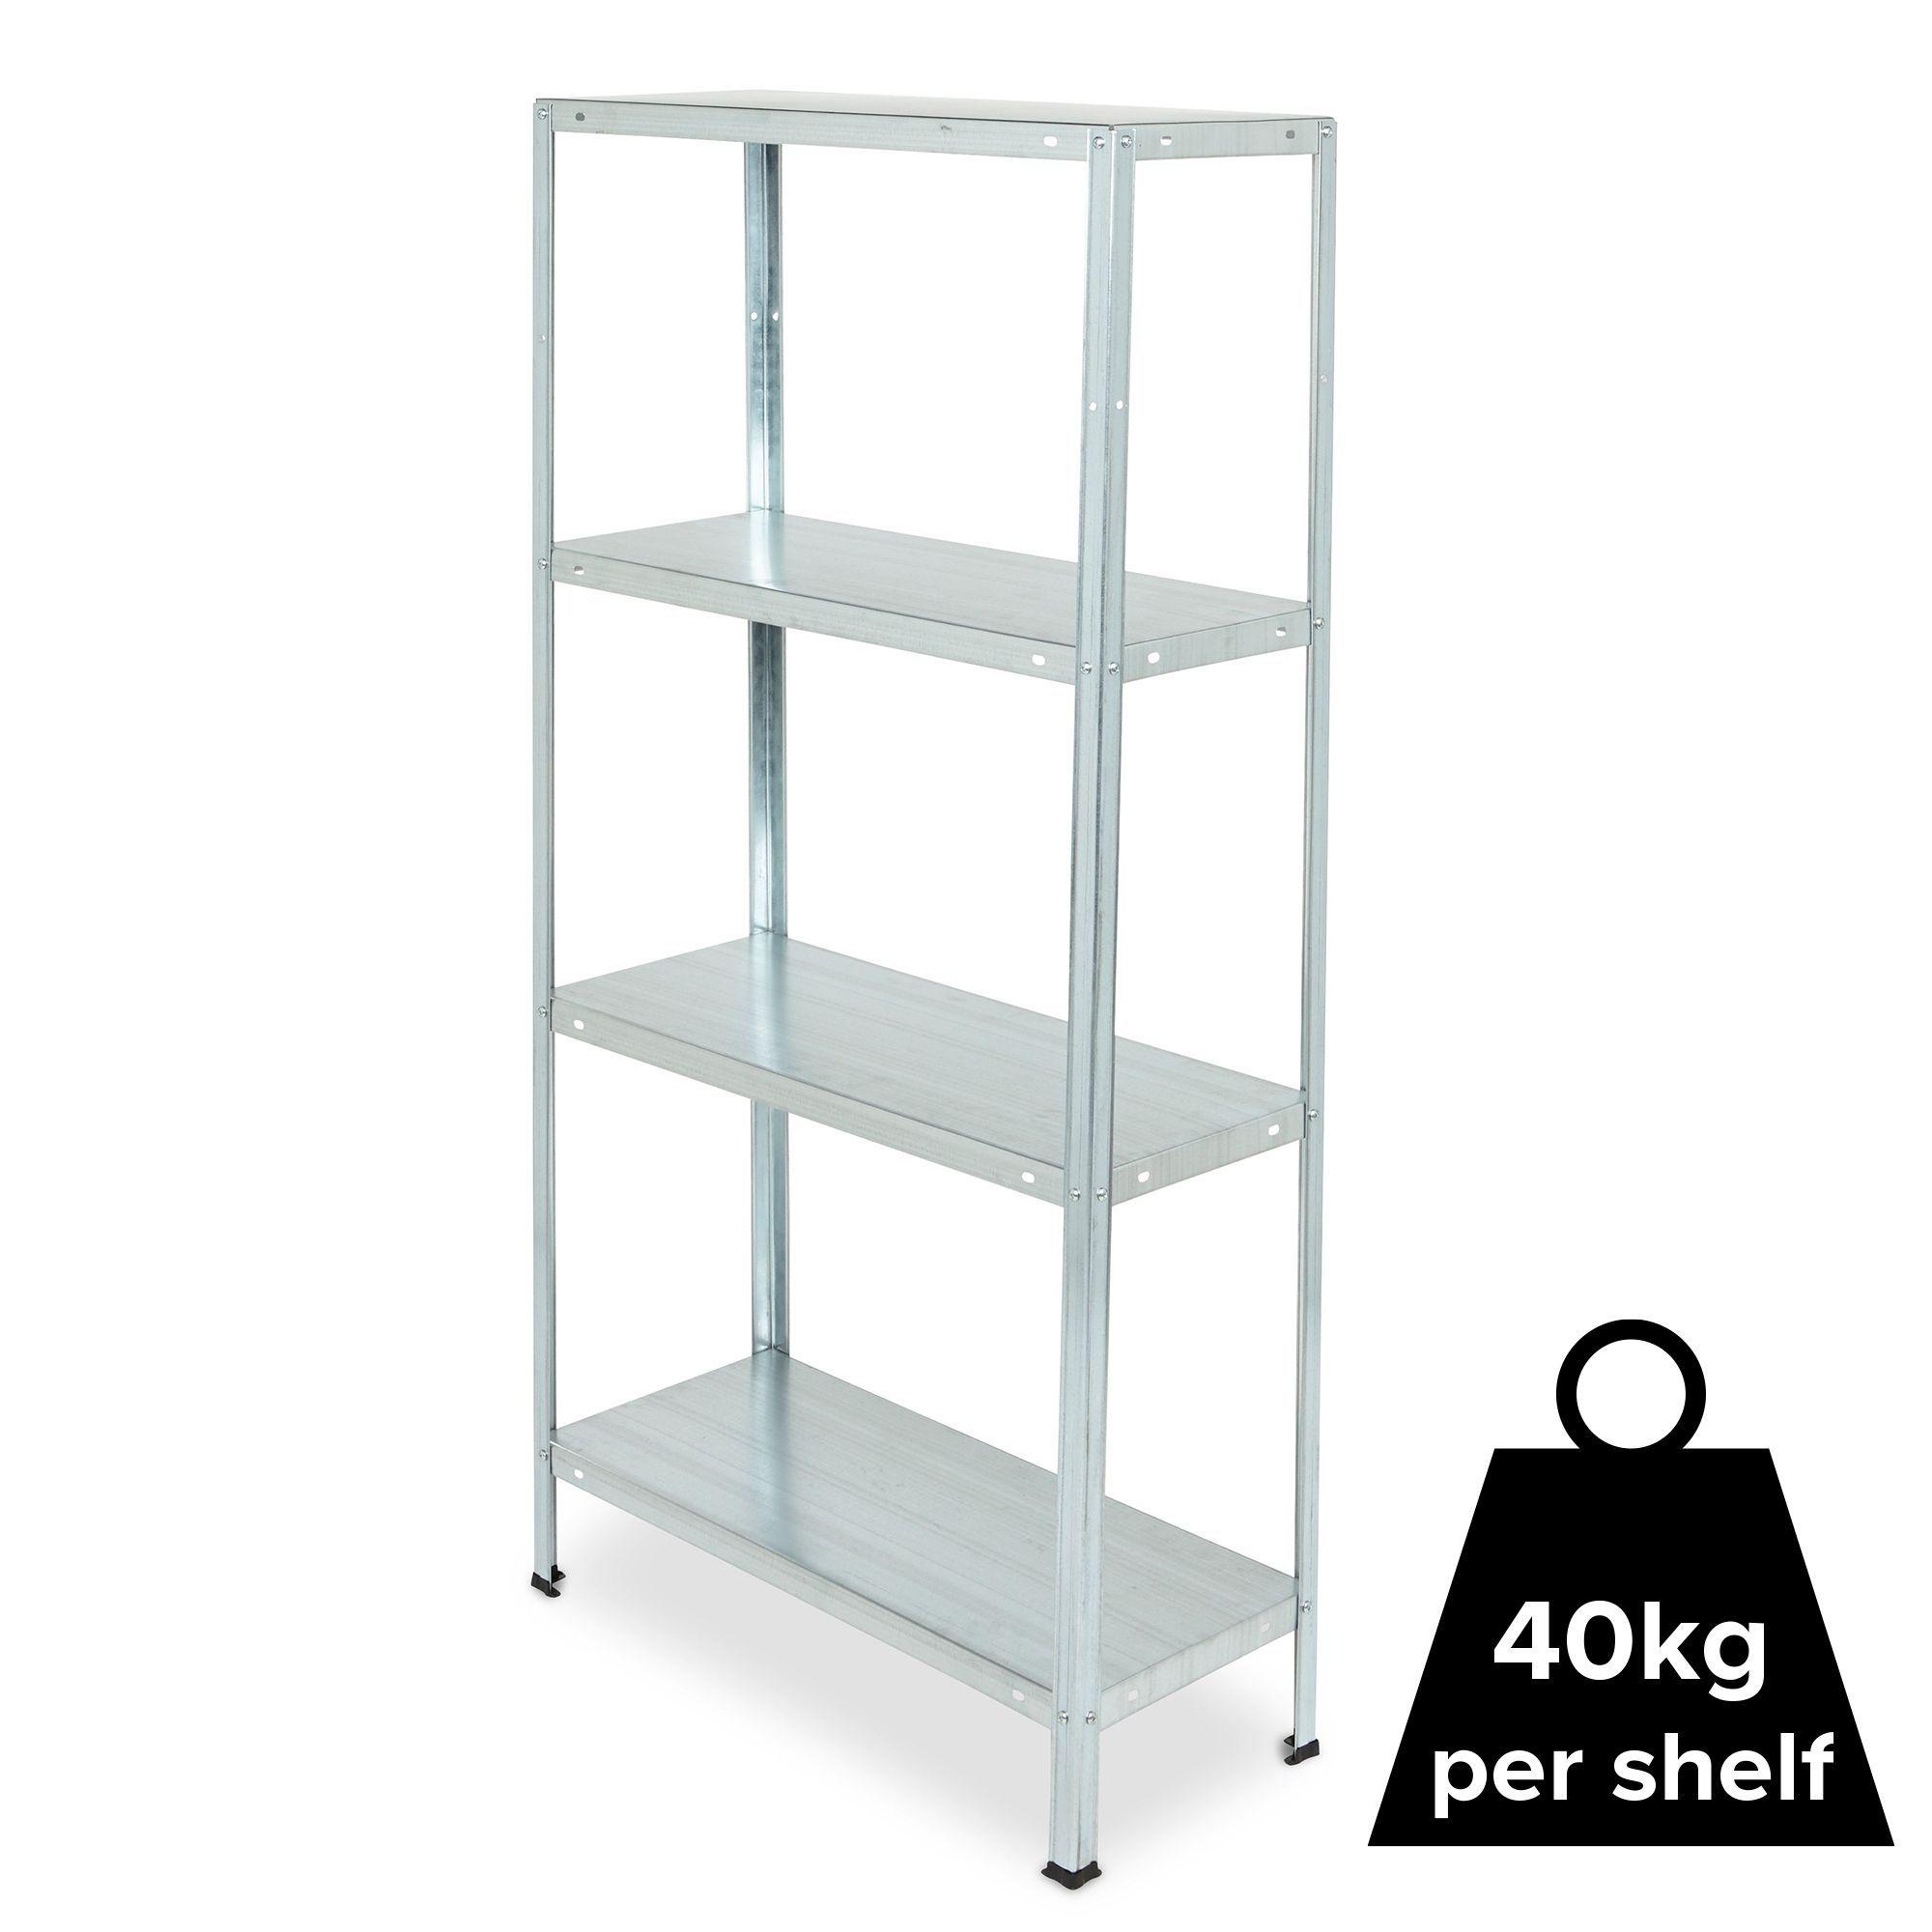 4 shelf steel shelving unit h 1400mm w 700mm